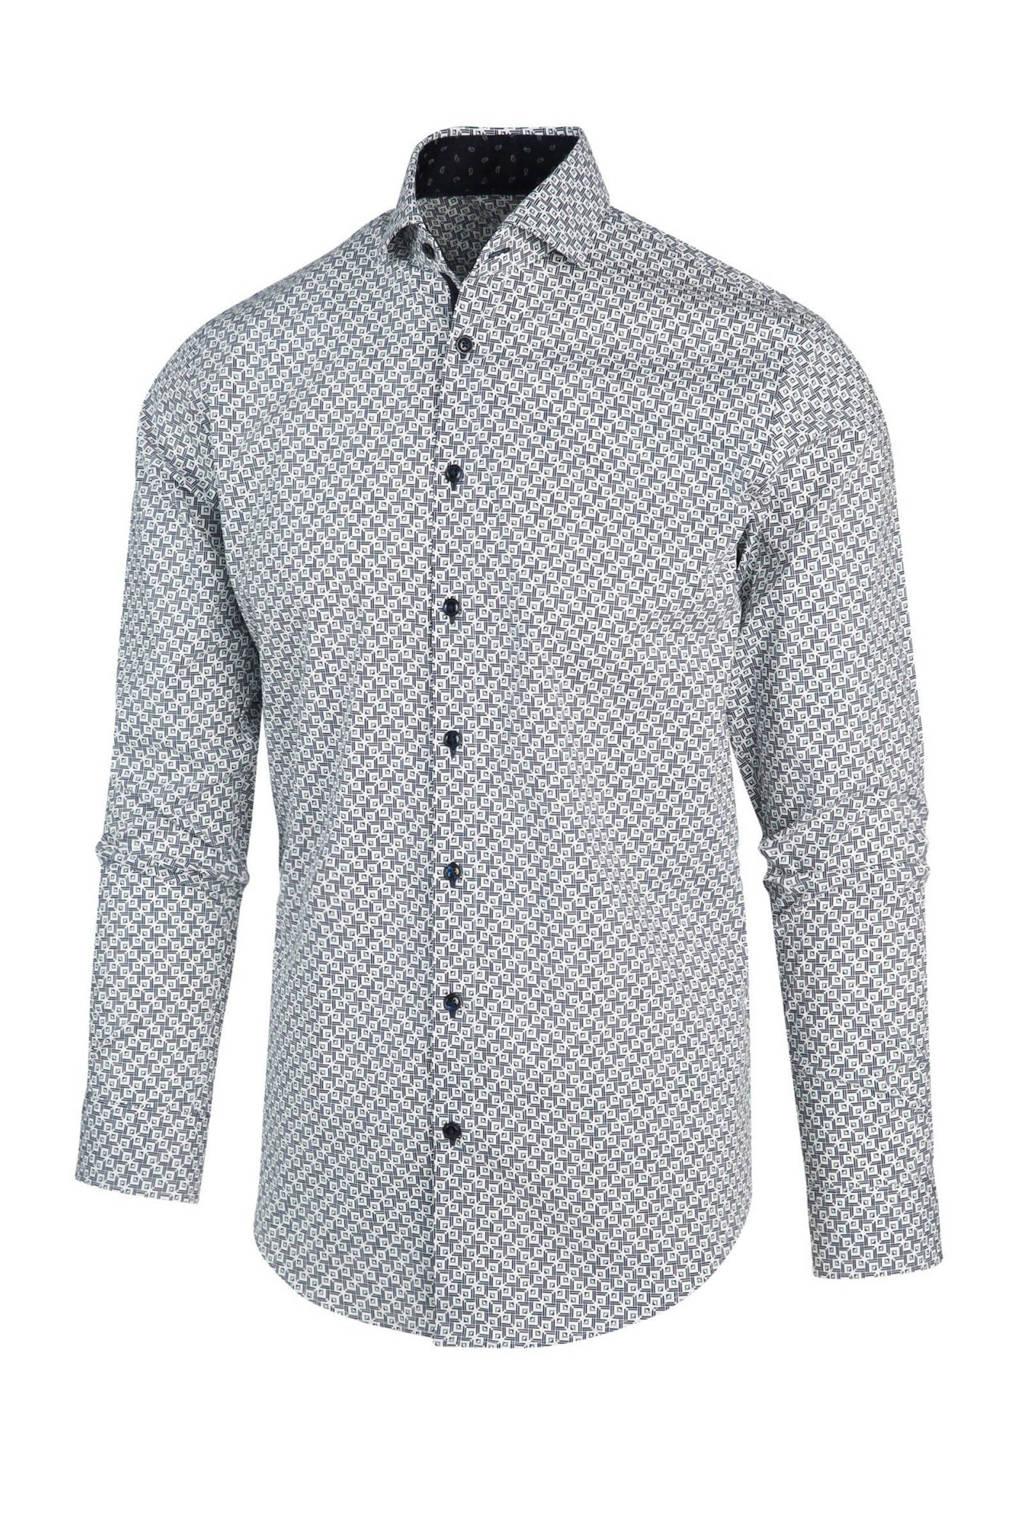 Blue Industry regular fit overhemd met all over print blauw/wit, Blauw/wit